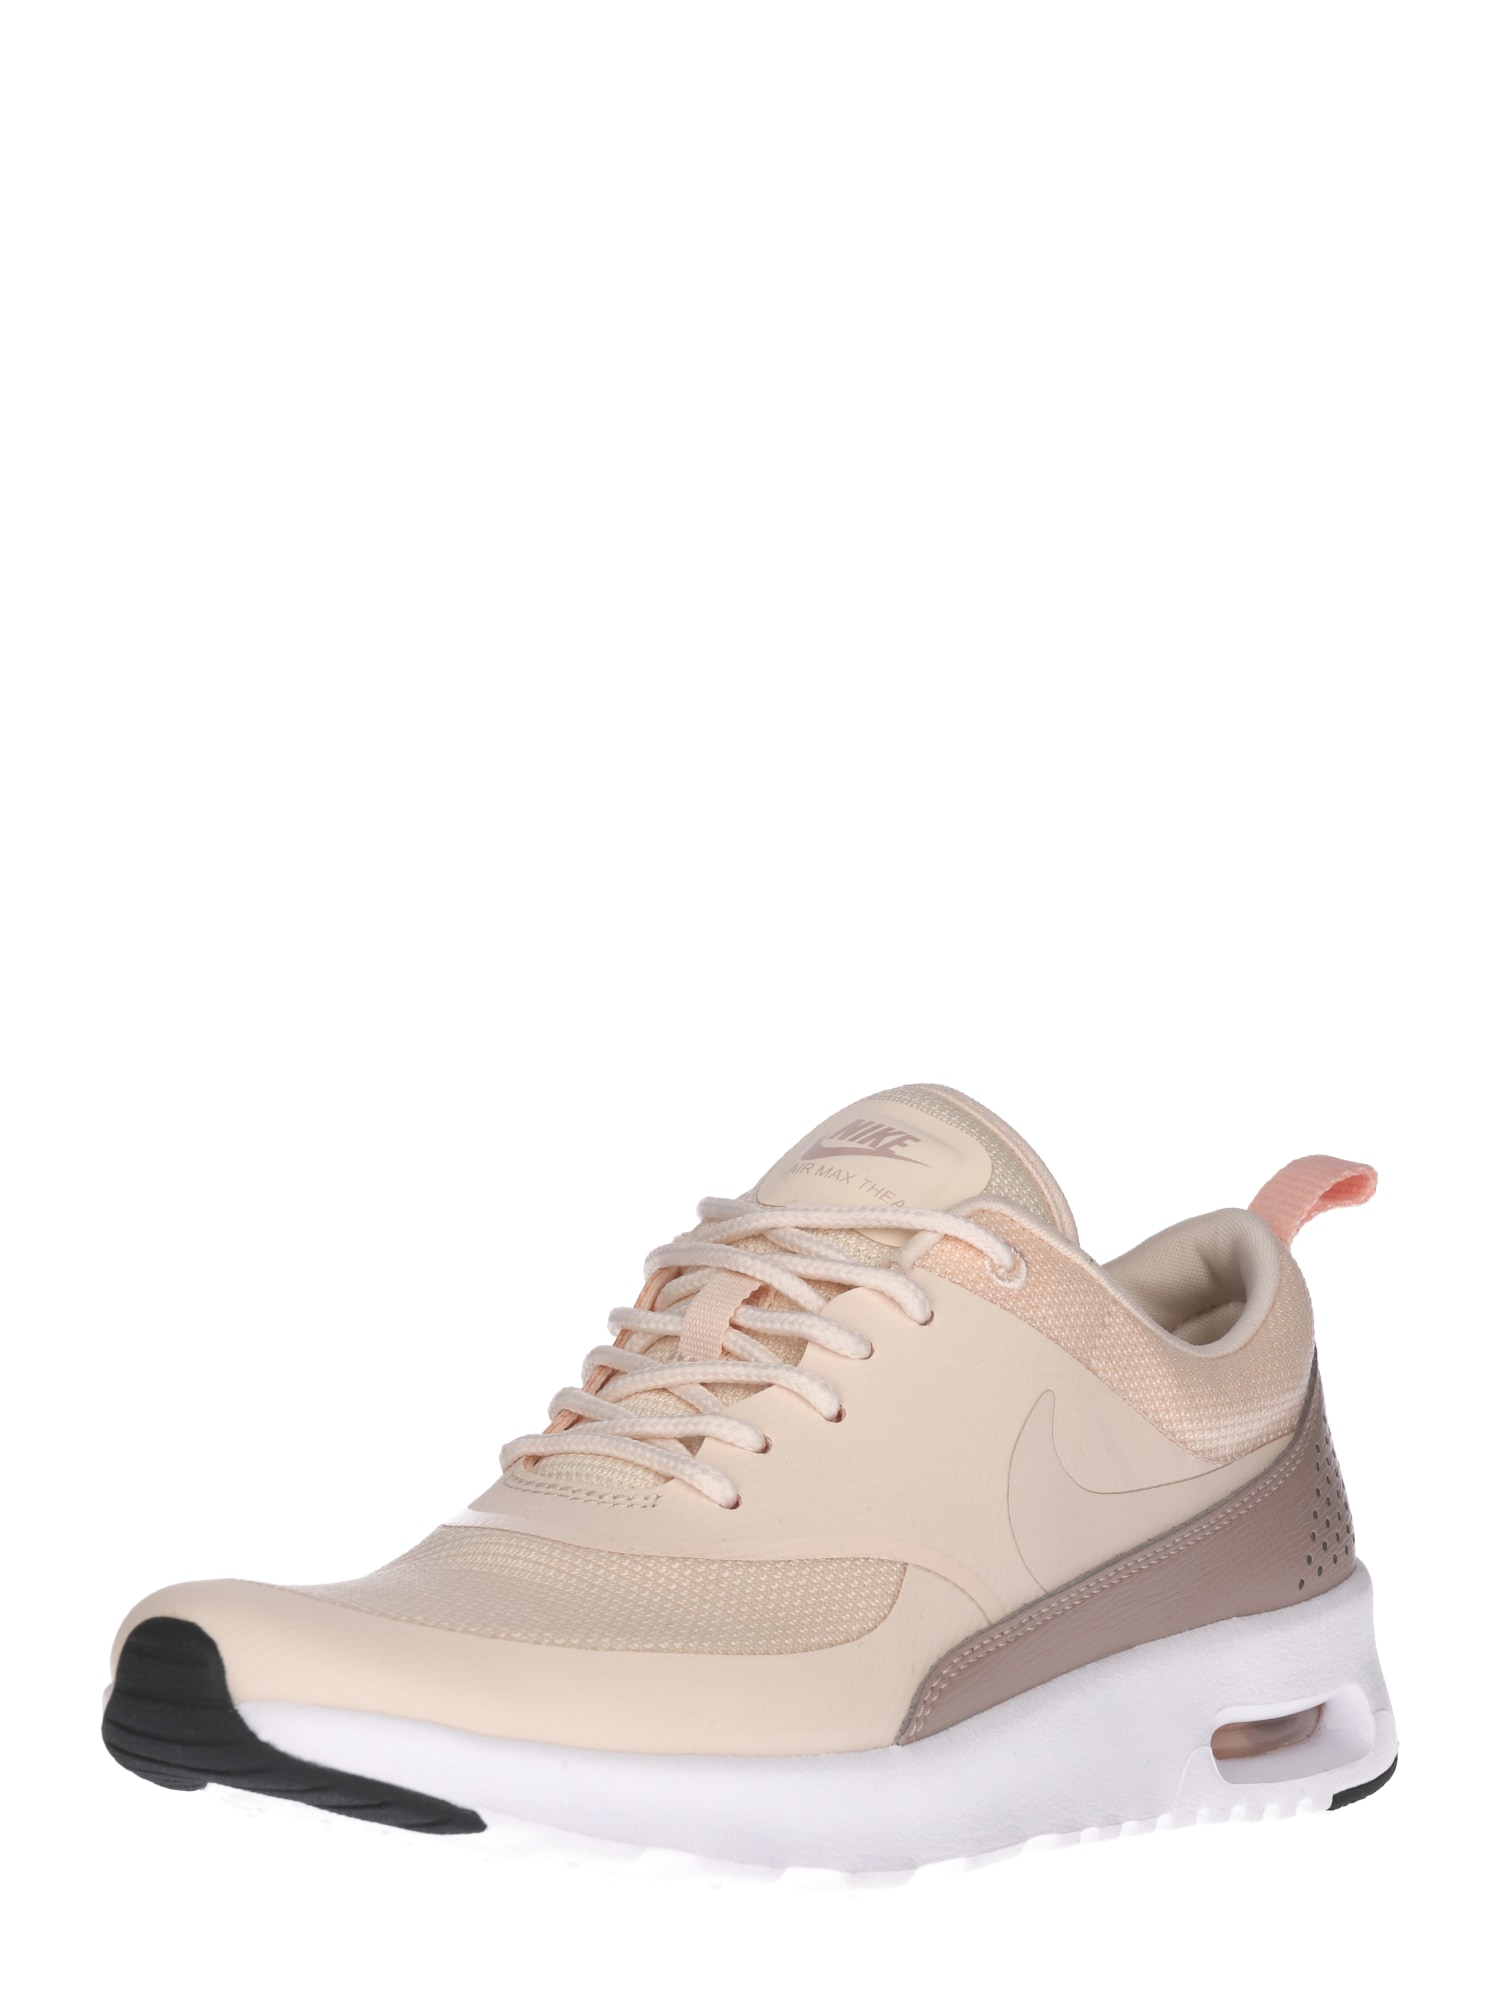 Nike Sportswear, Dames Sneakers laag 'AIR MAX THEA', poederroze